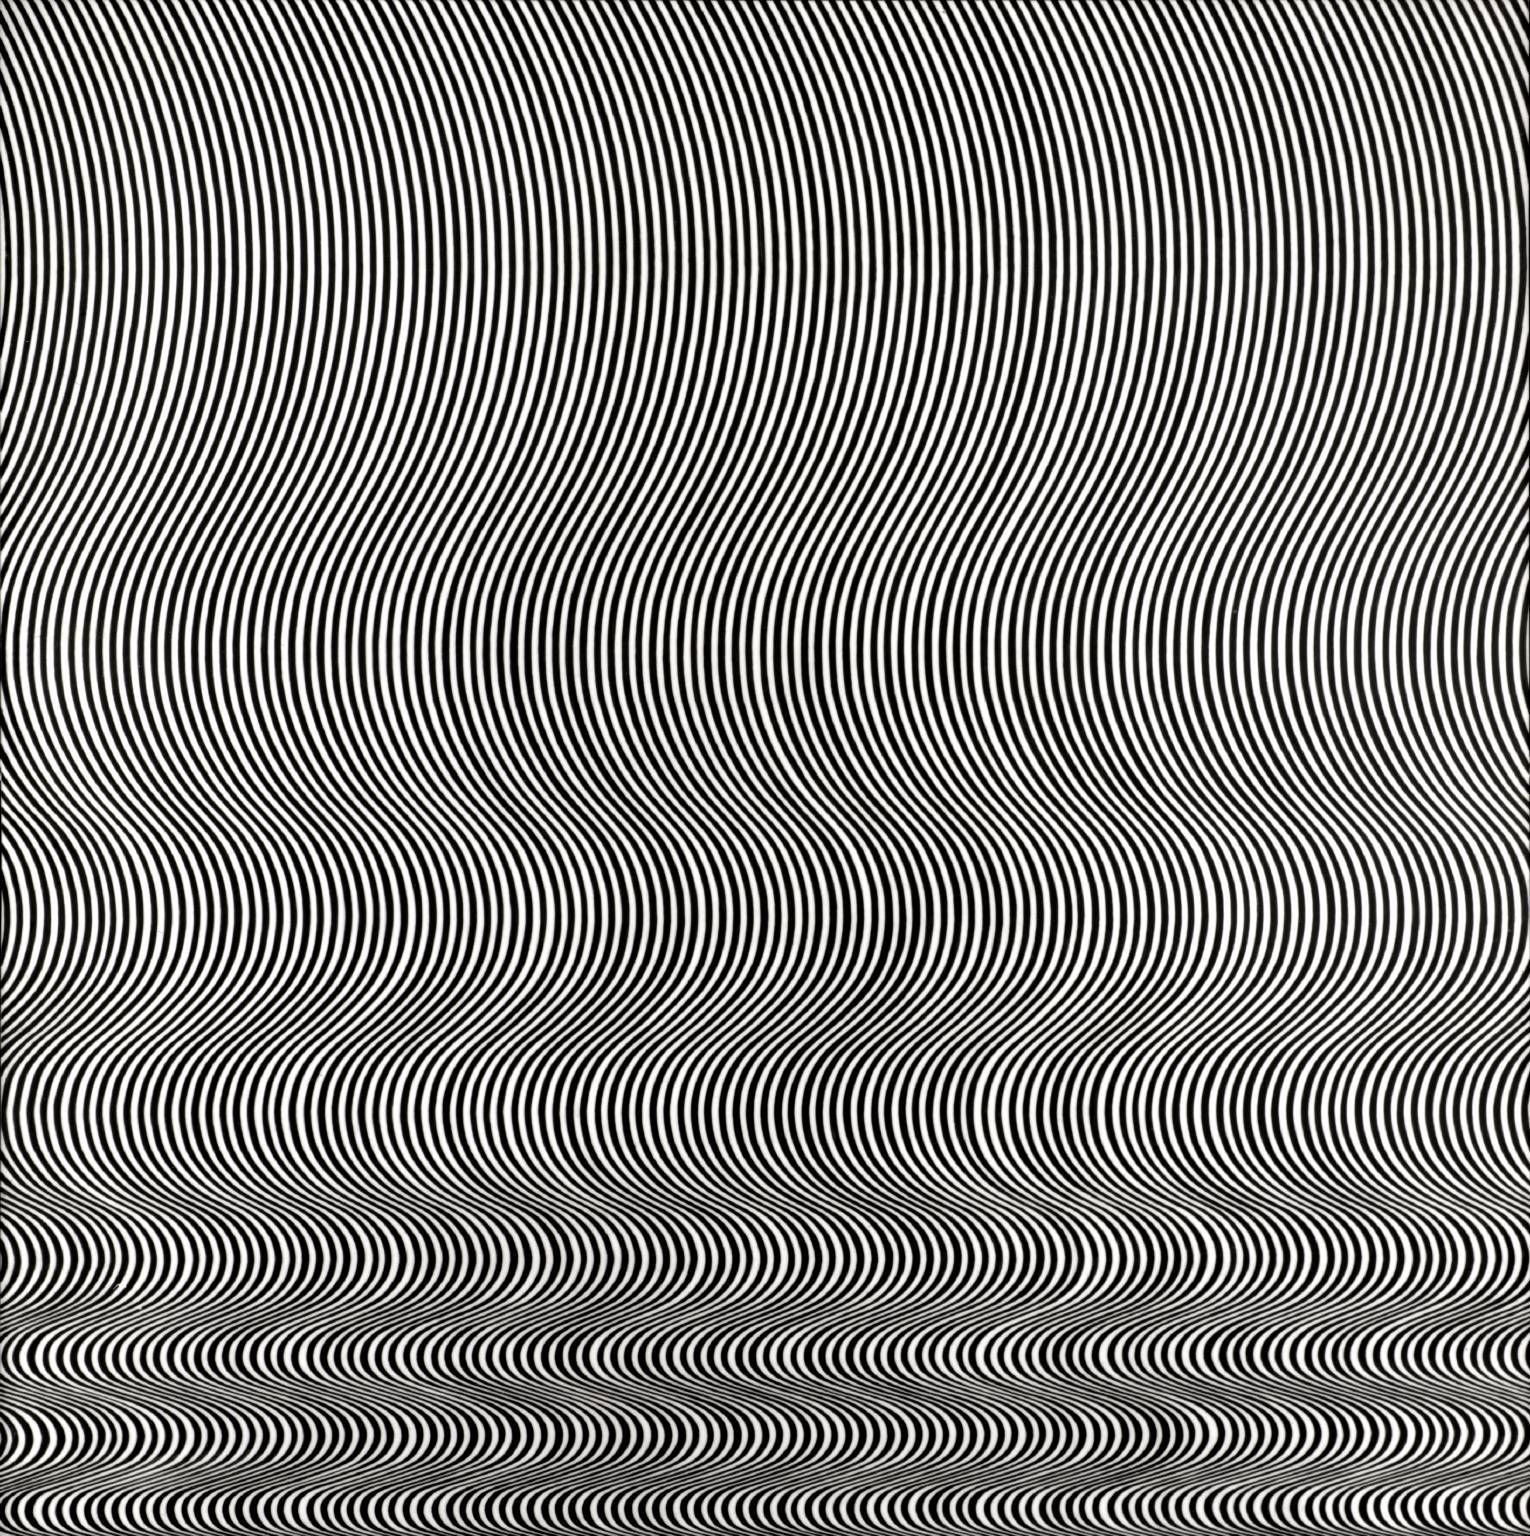 Juxtapoz- Bridget Riley Op Art and geometric abstraction